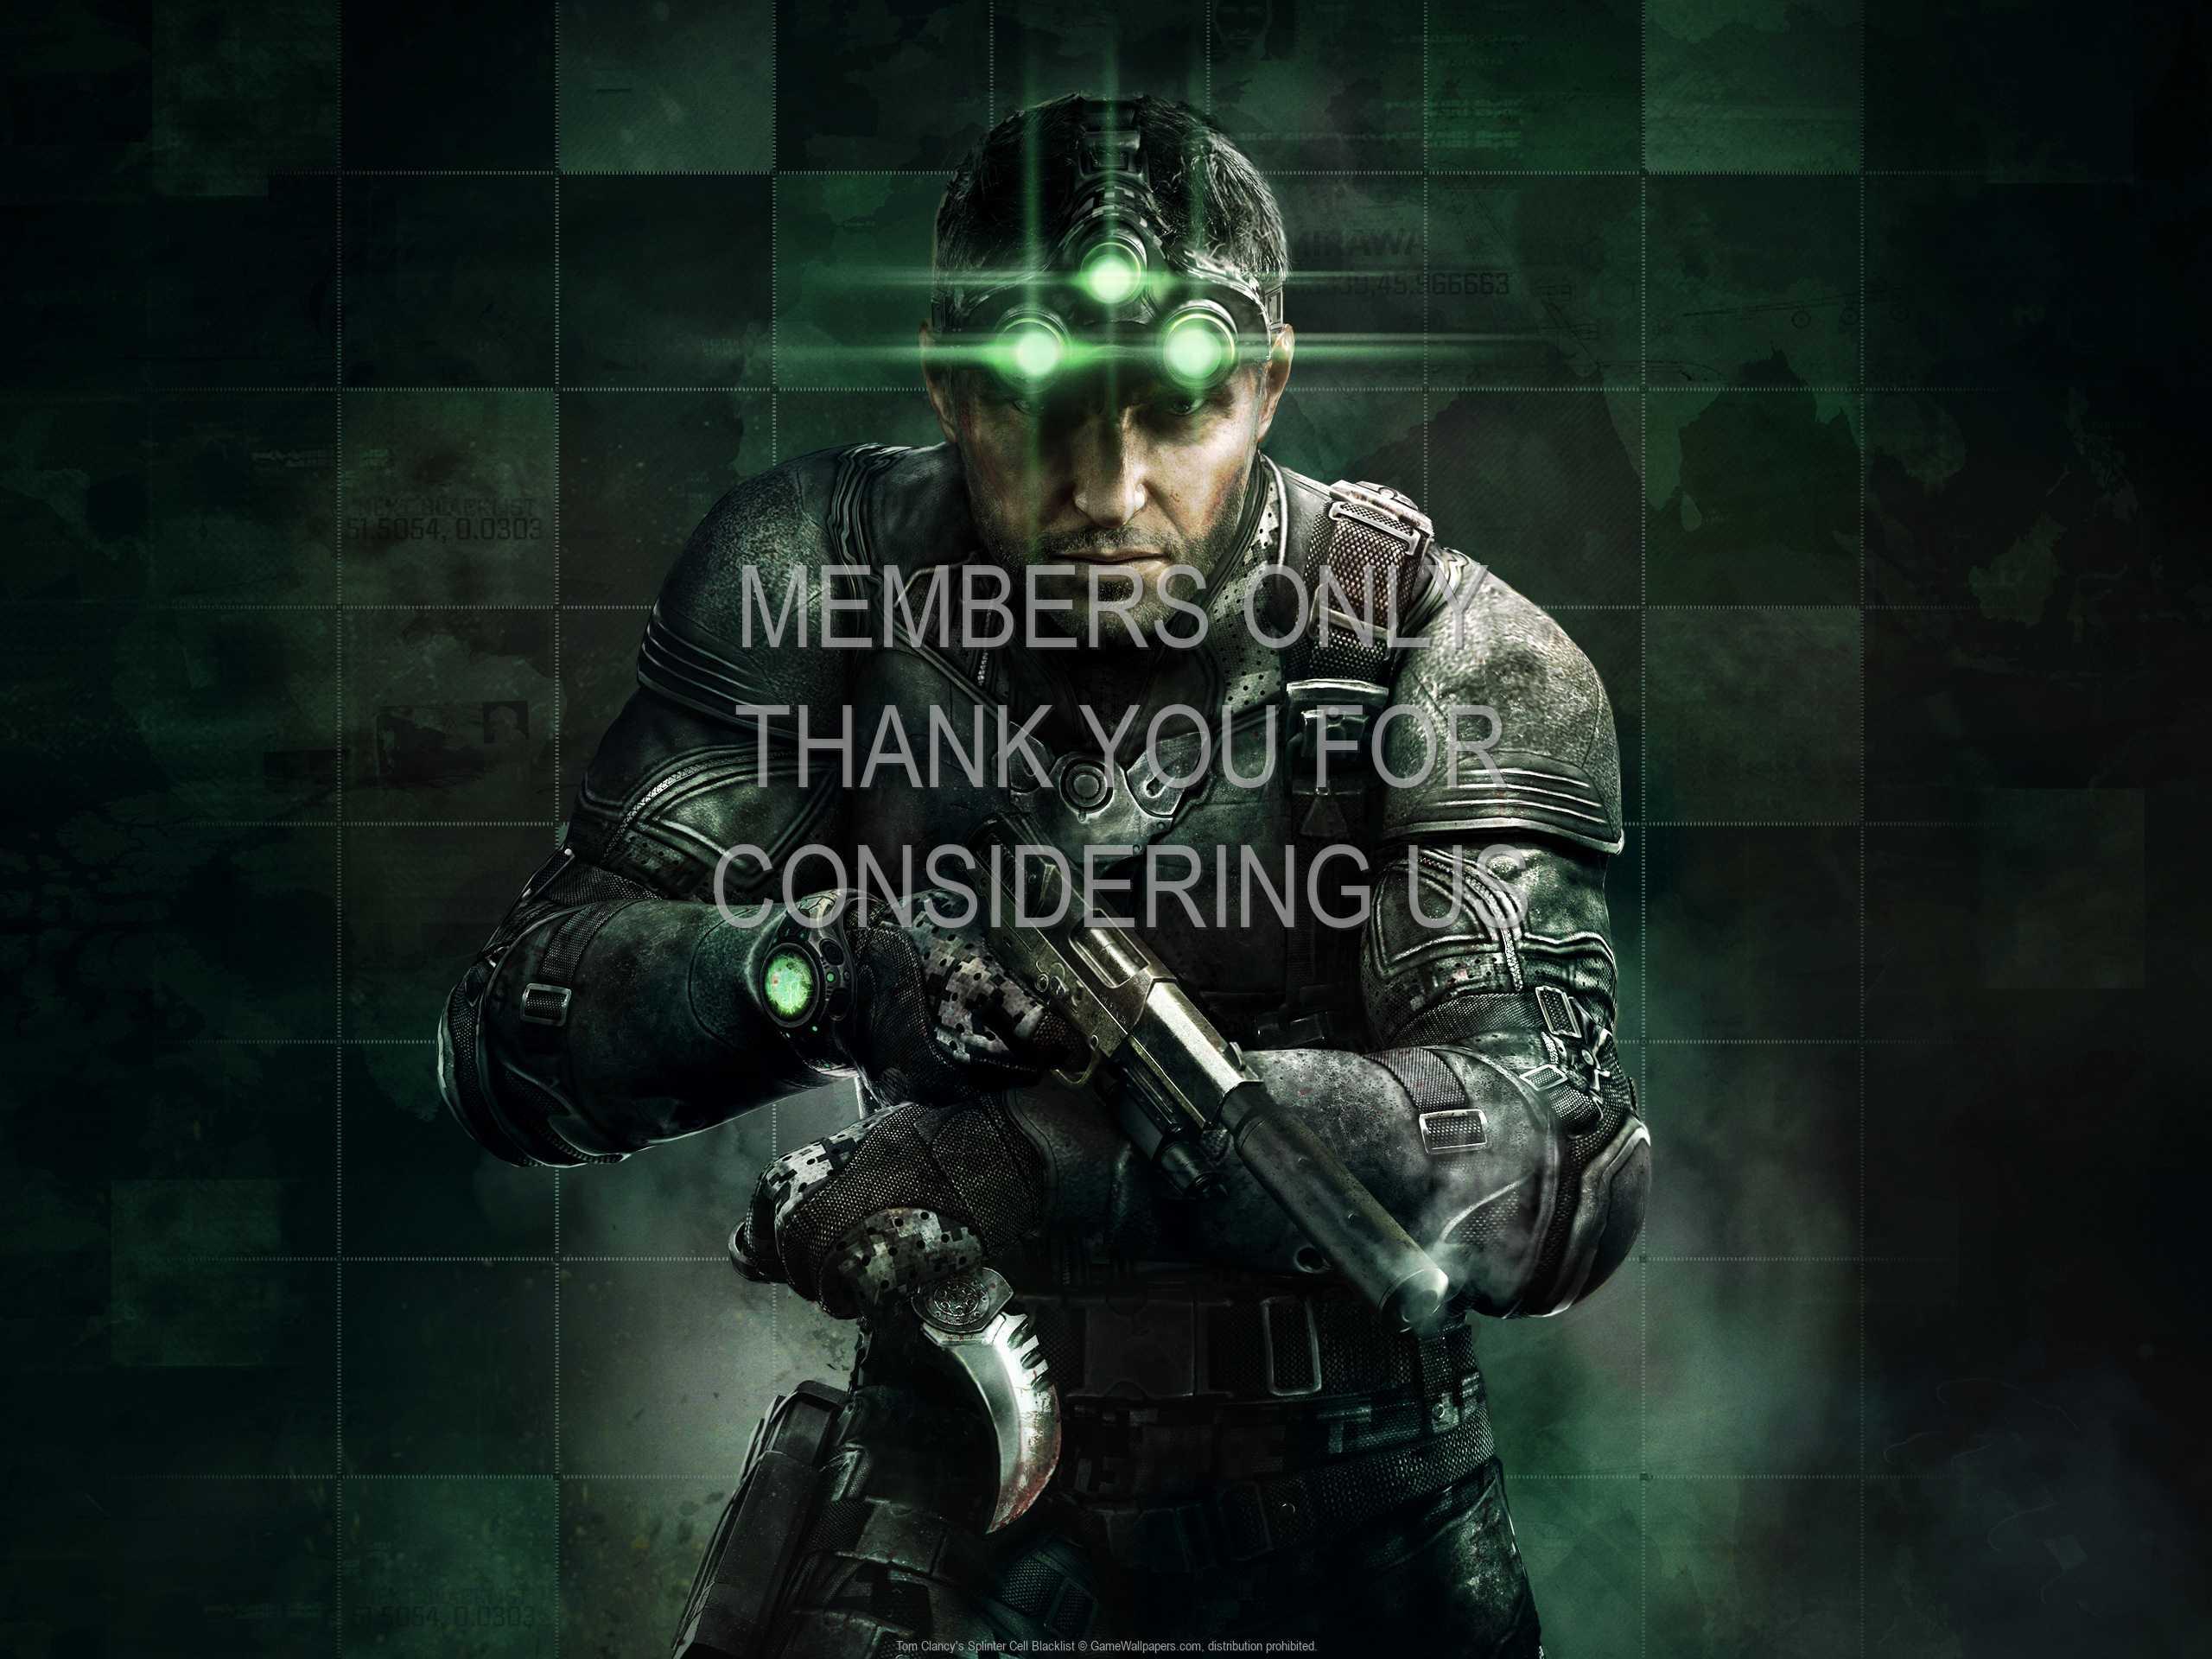 Tom Clancy's Splinter Cell: Blacklist 1080p Horizontal Handy Hintergrundbild 04